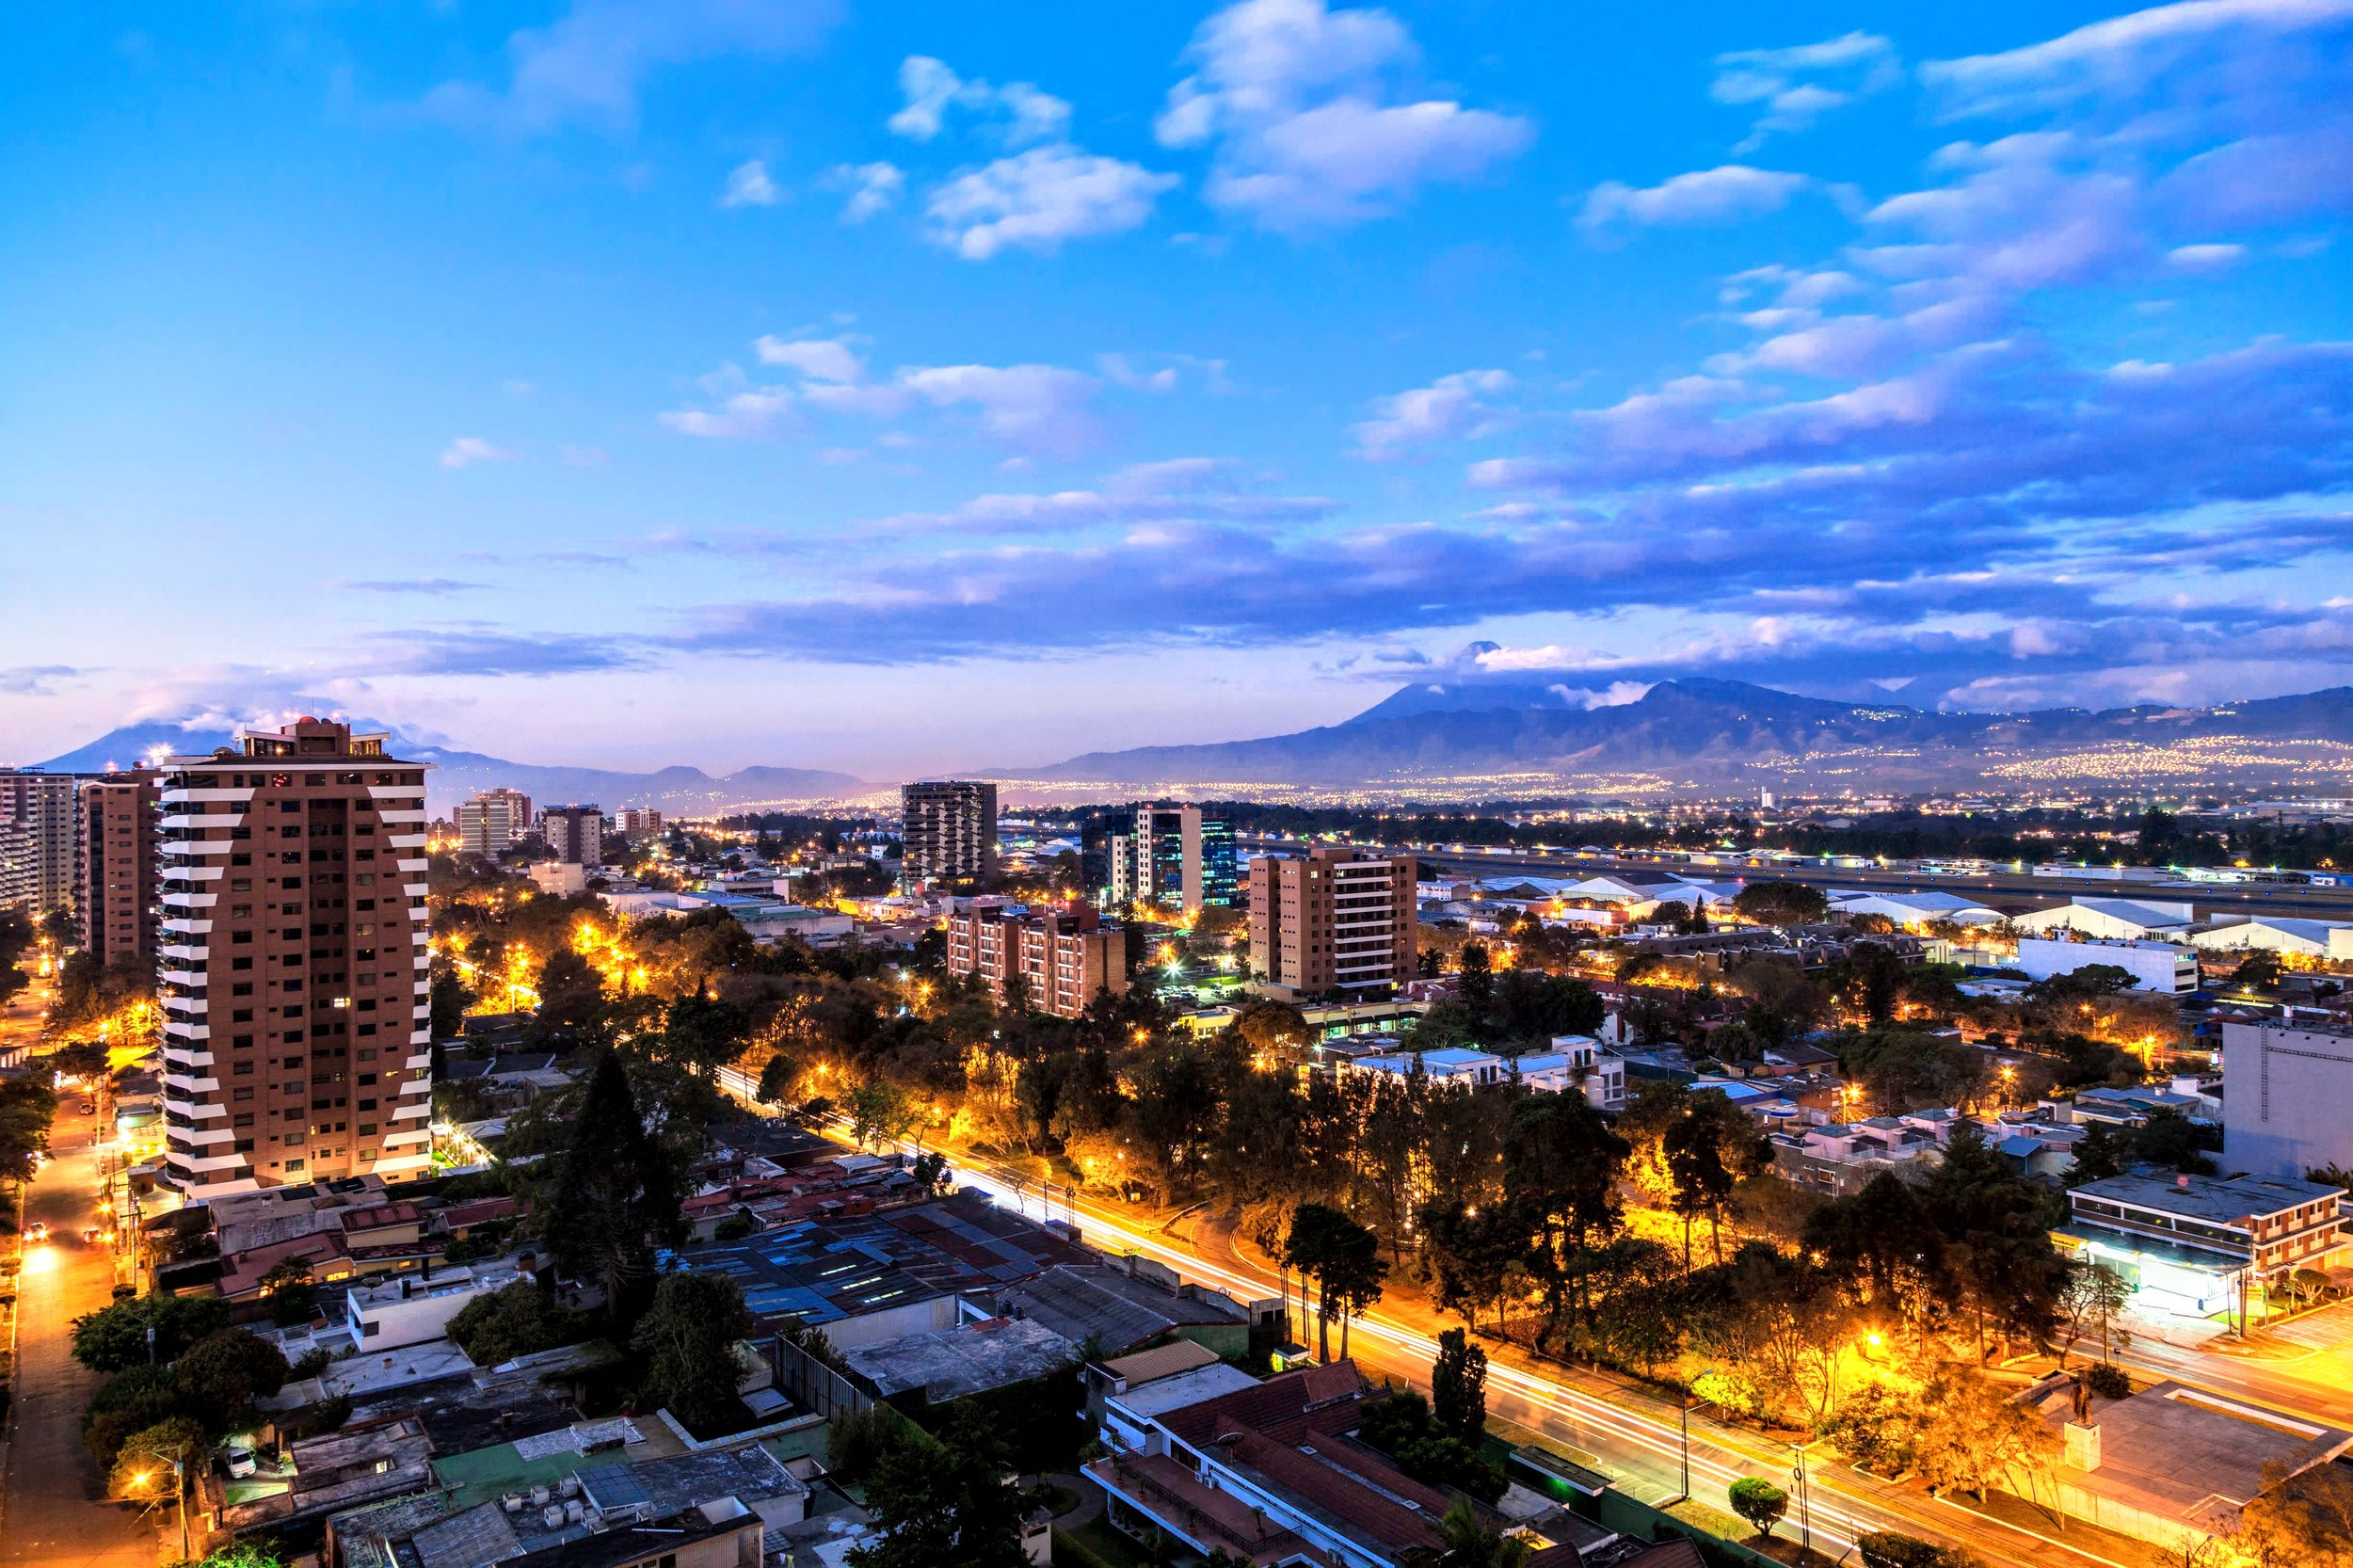 Guatemala City #2(1).jpg